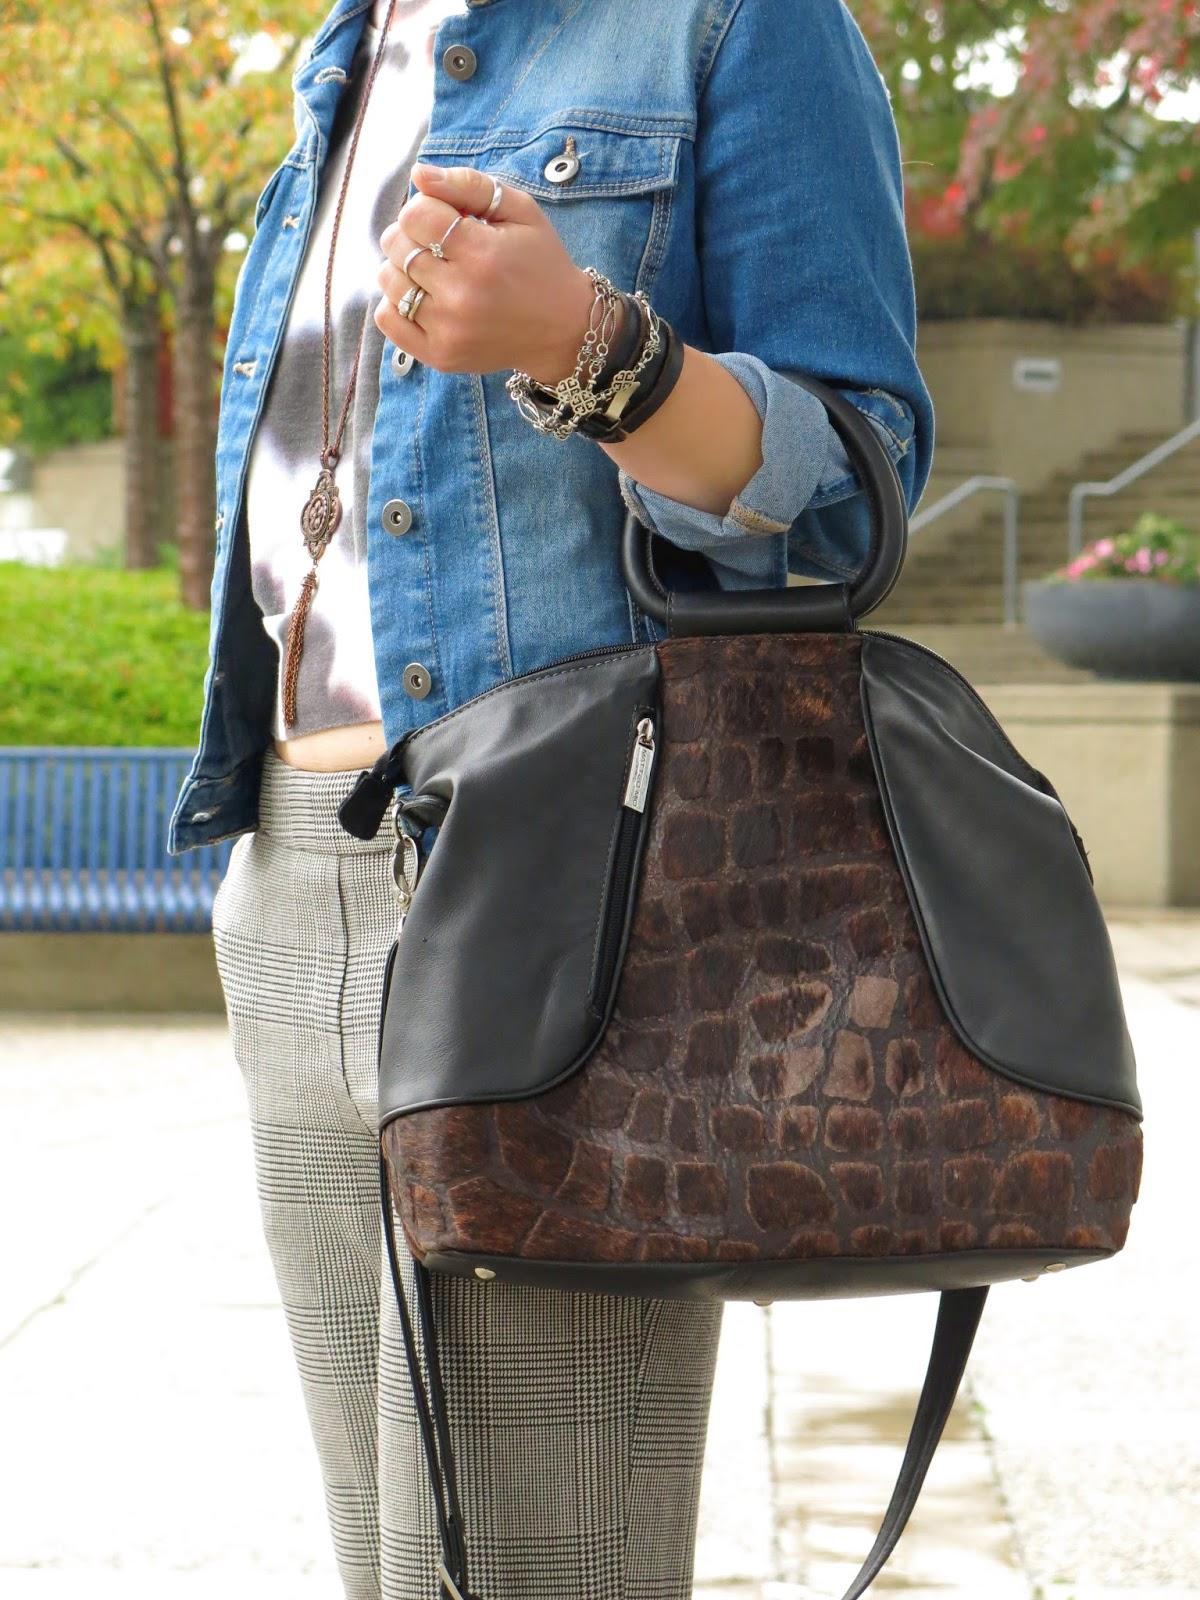 slouchy plaid pants, cropped sweatshirt, denim jacket, and Matteo Mio bag